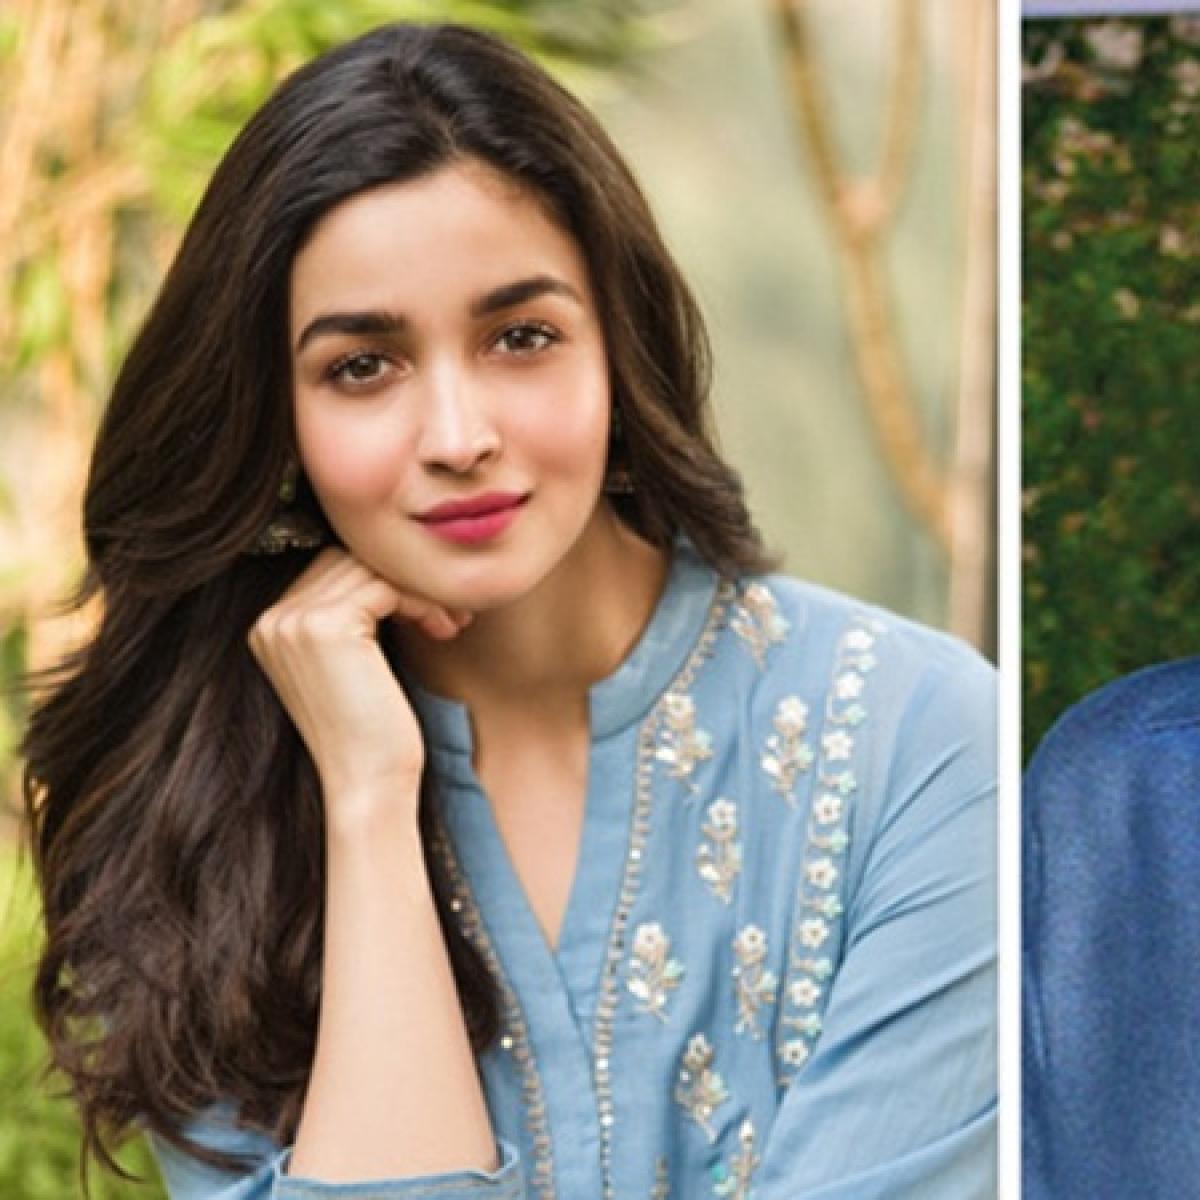 Alia Bhatt won't sing and dance in Sanjay Leela Bhansali's 'Gangubai Kathiawadi'